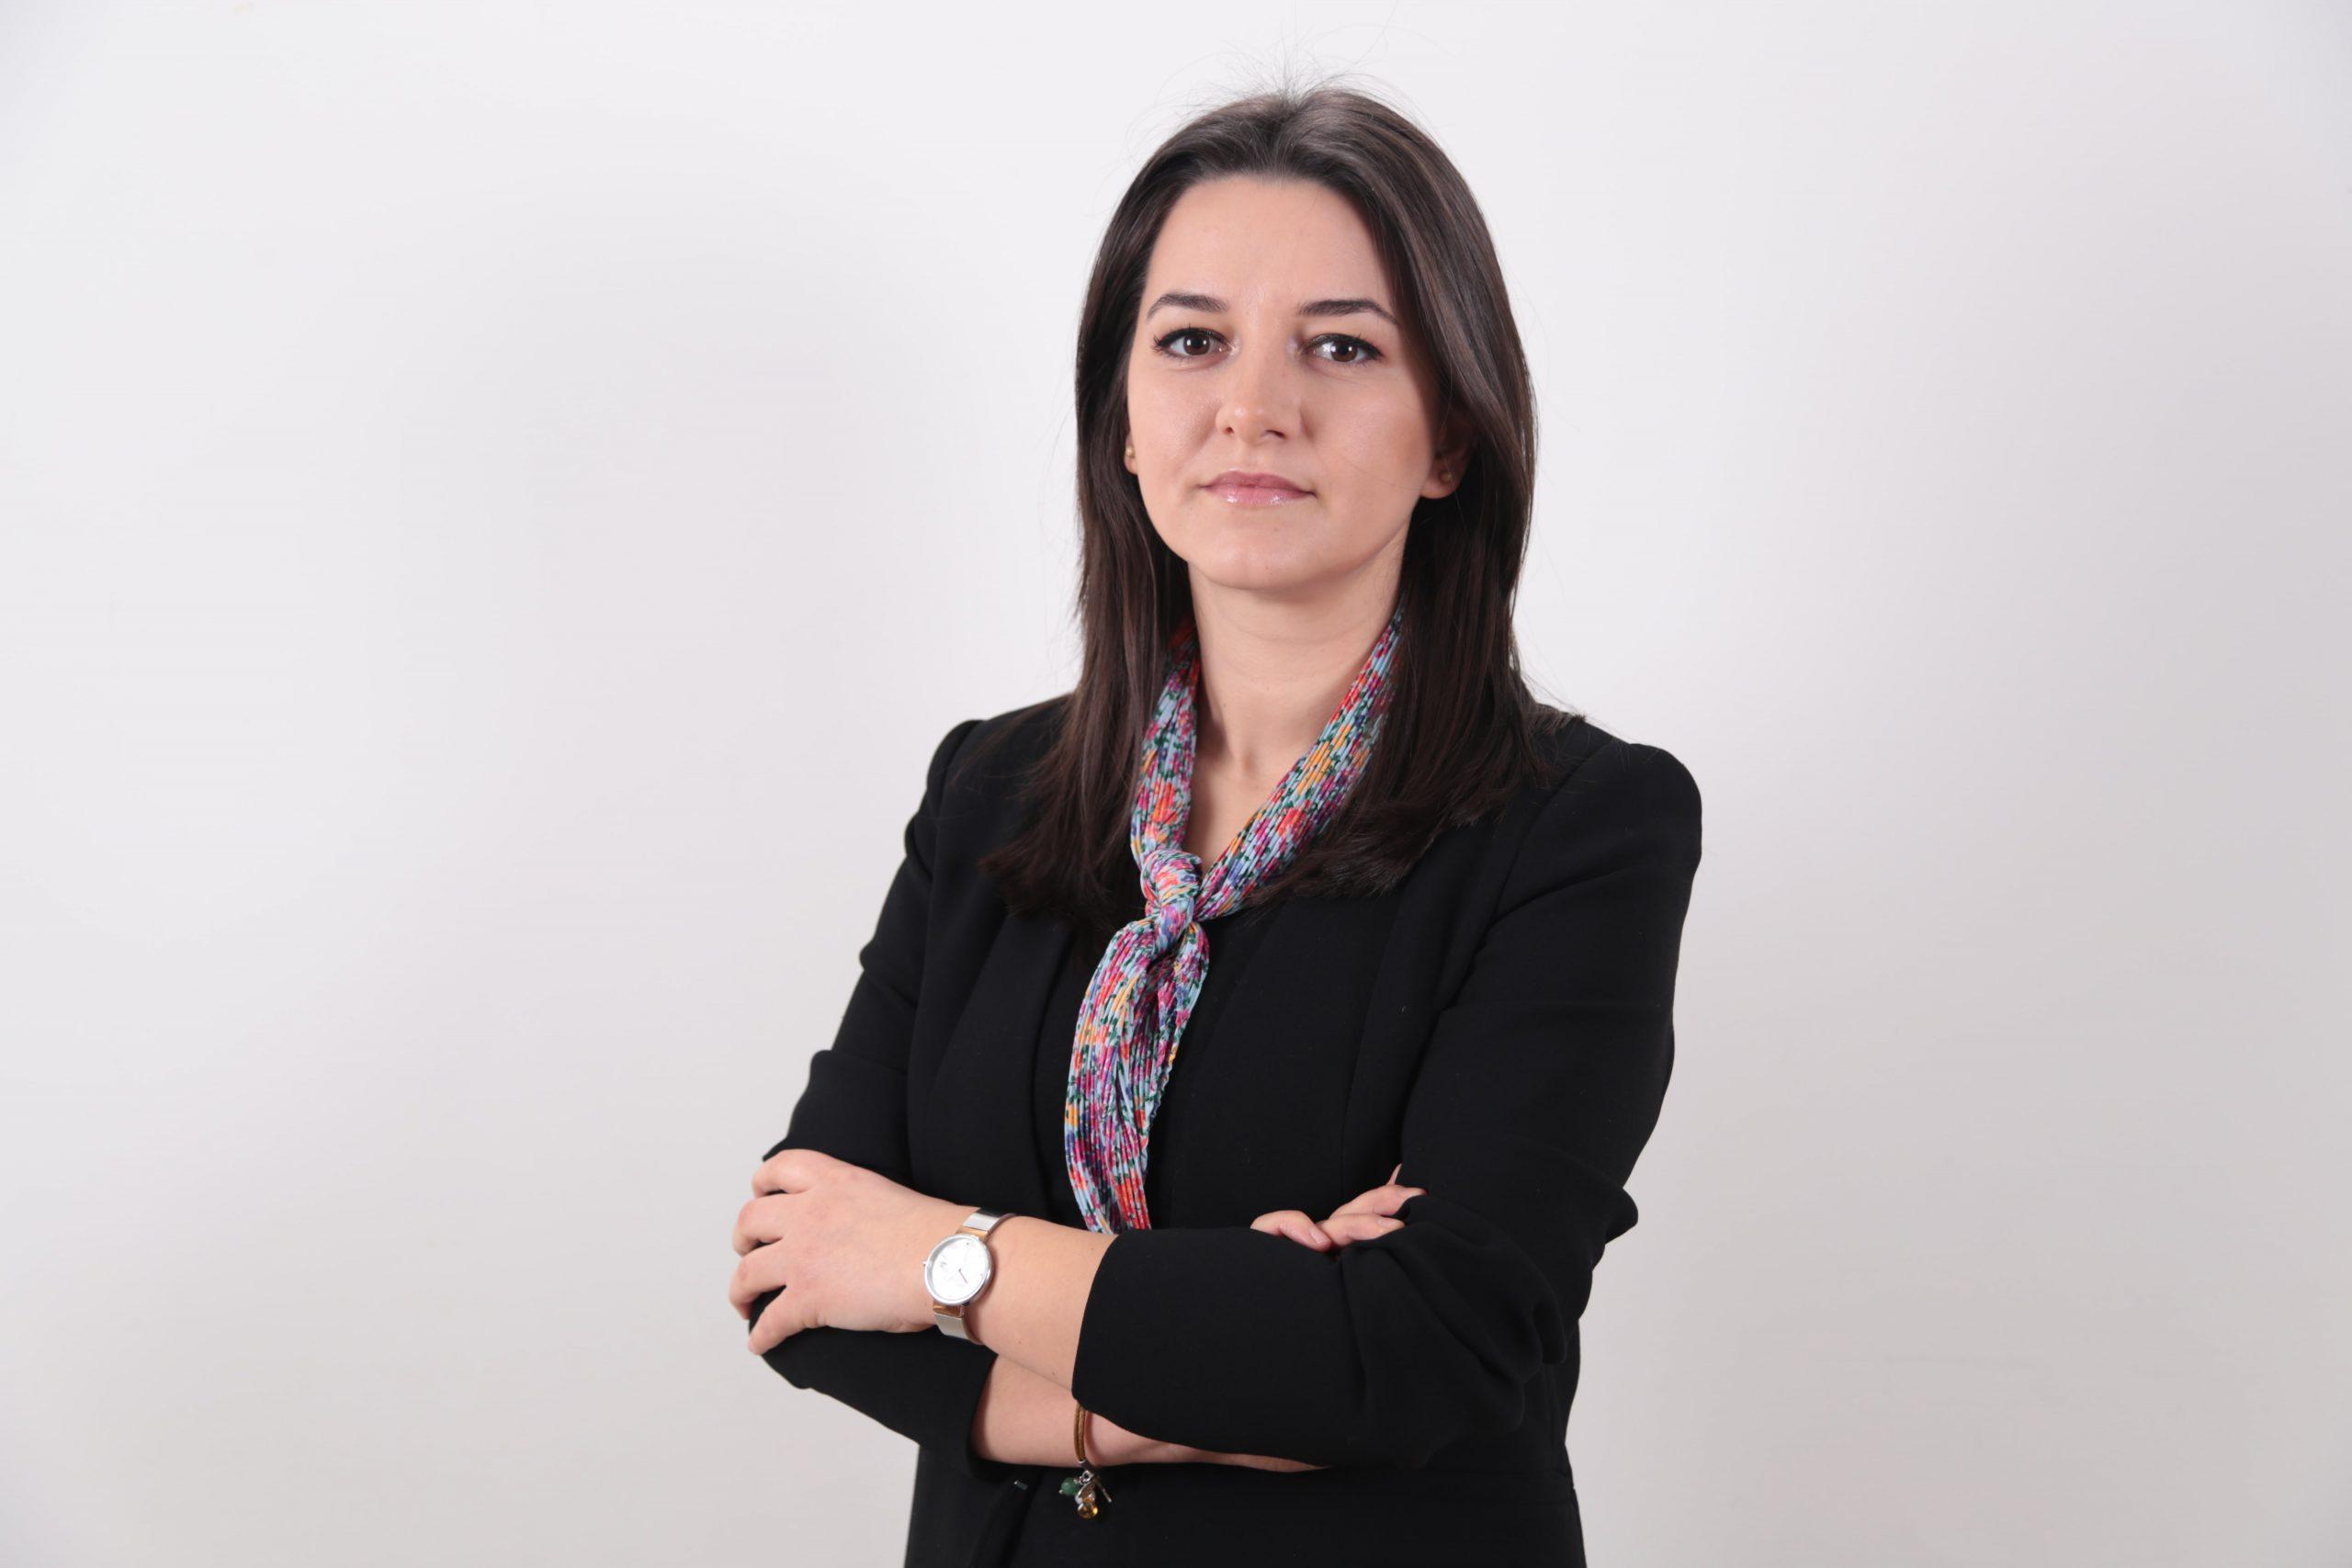 Edrina Gashi